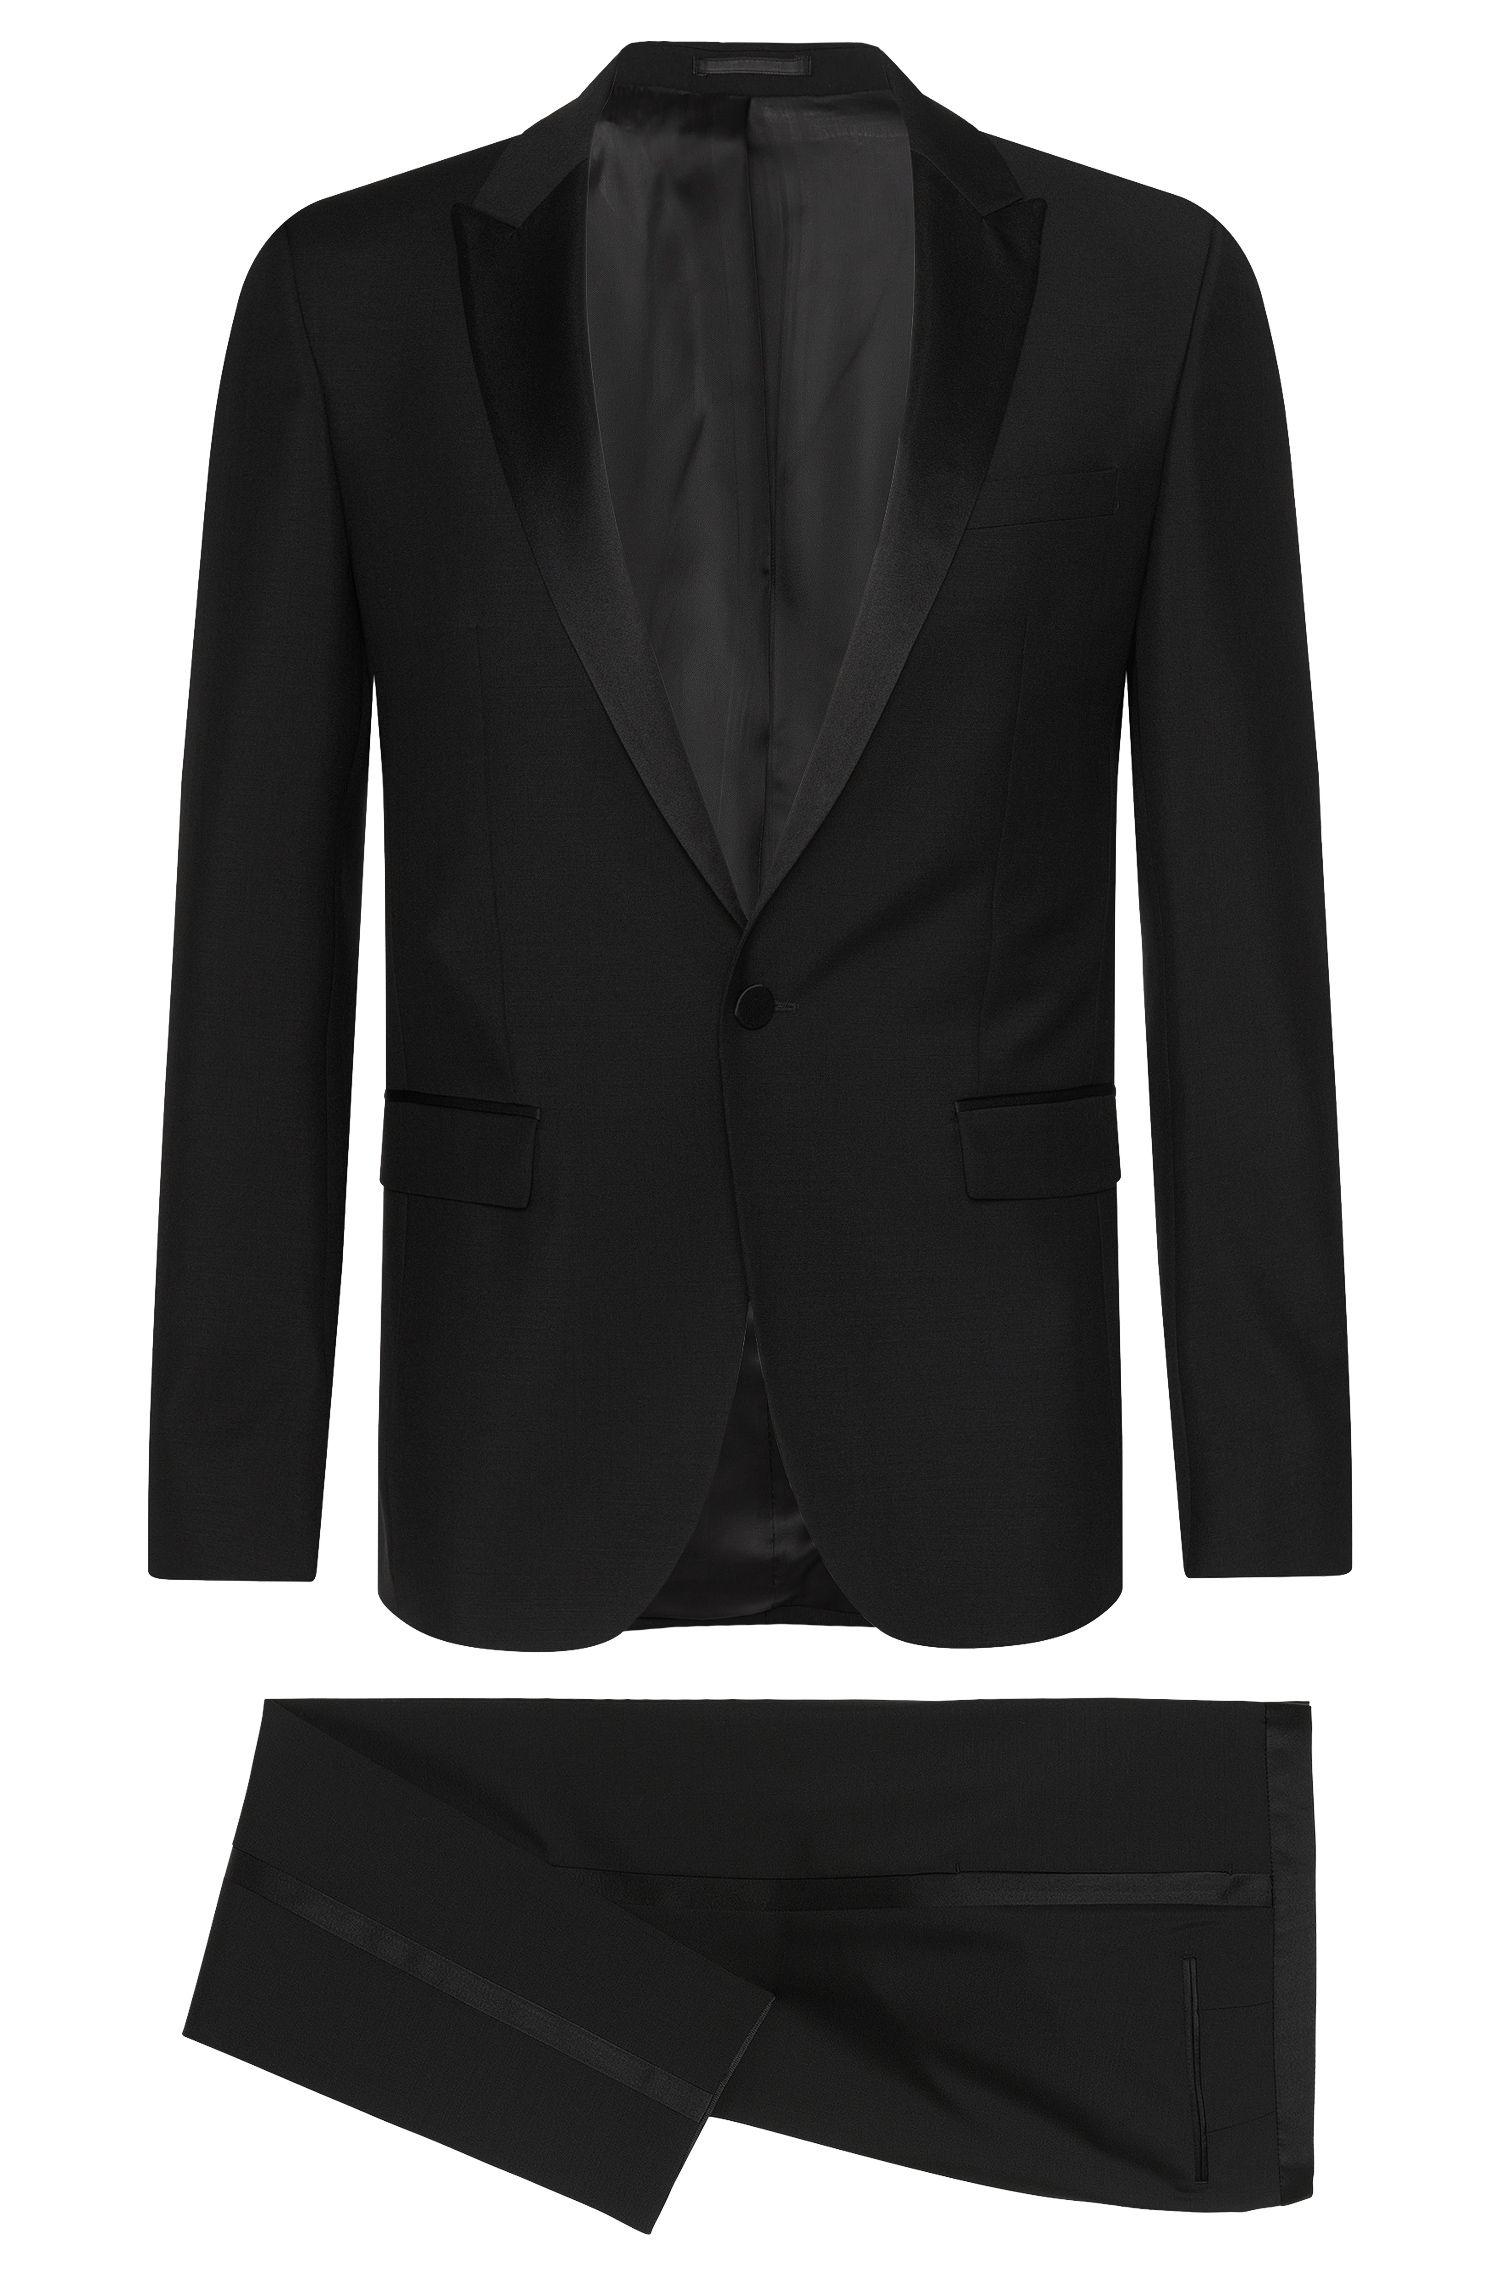 'Reysen/Weever' | Extra Slim Fit, Italian Virgin Wool Mohair Tuxedo